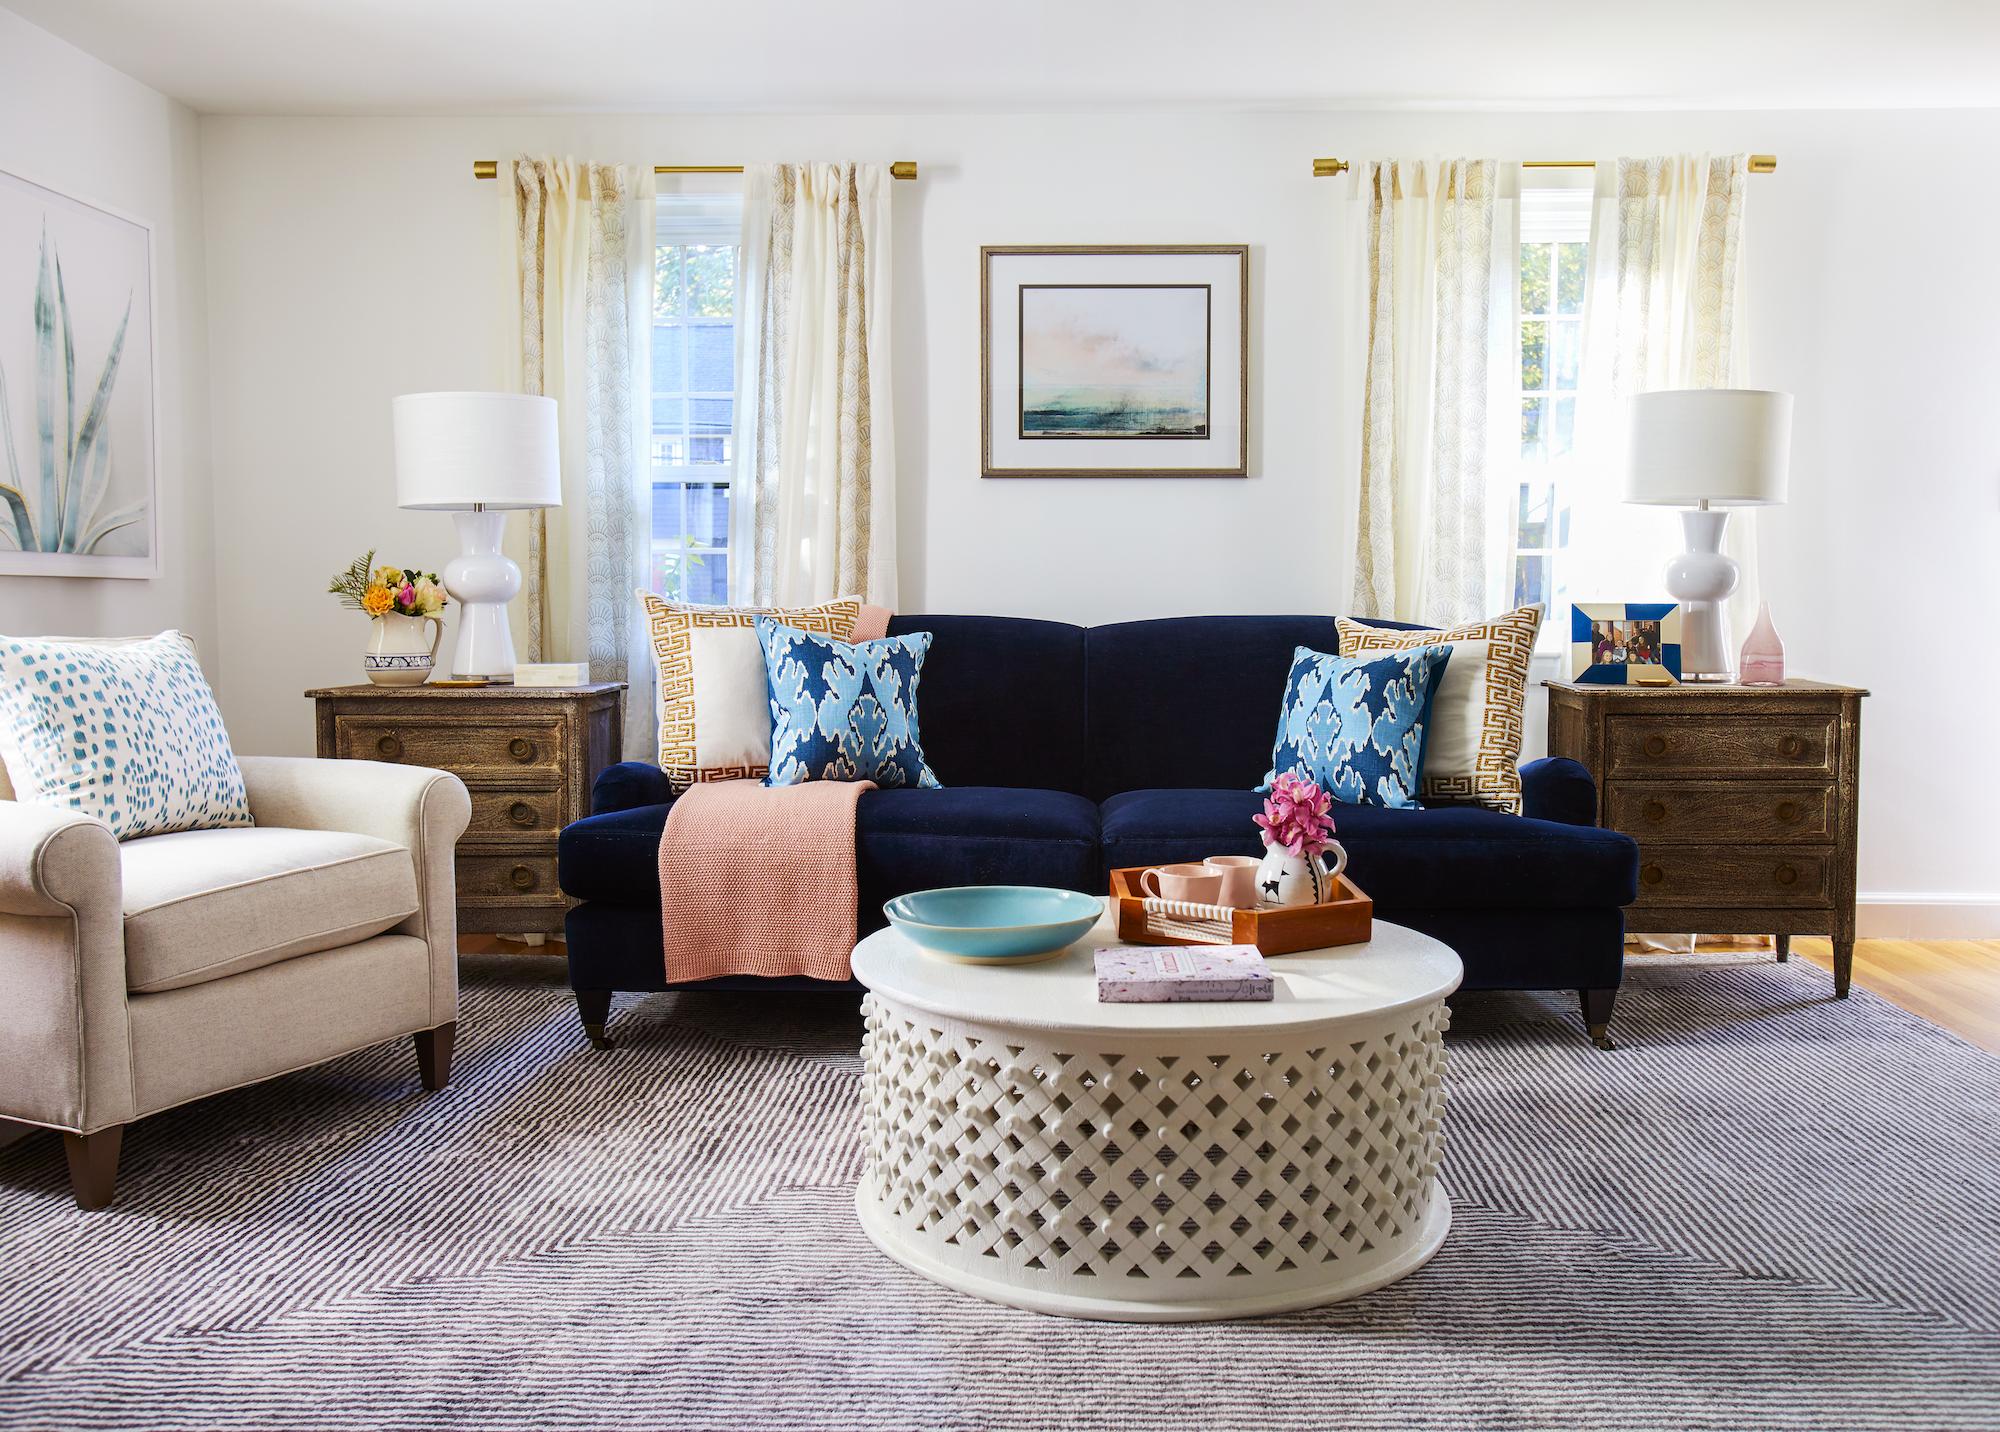 51 Best Living Room Ideas - Stylish Living Room Decorating Designs